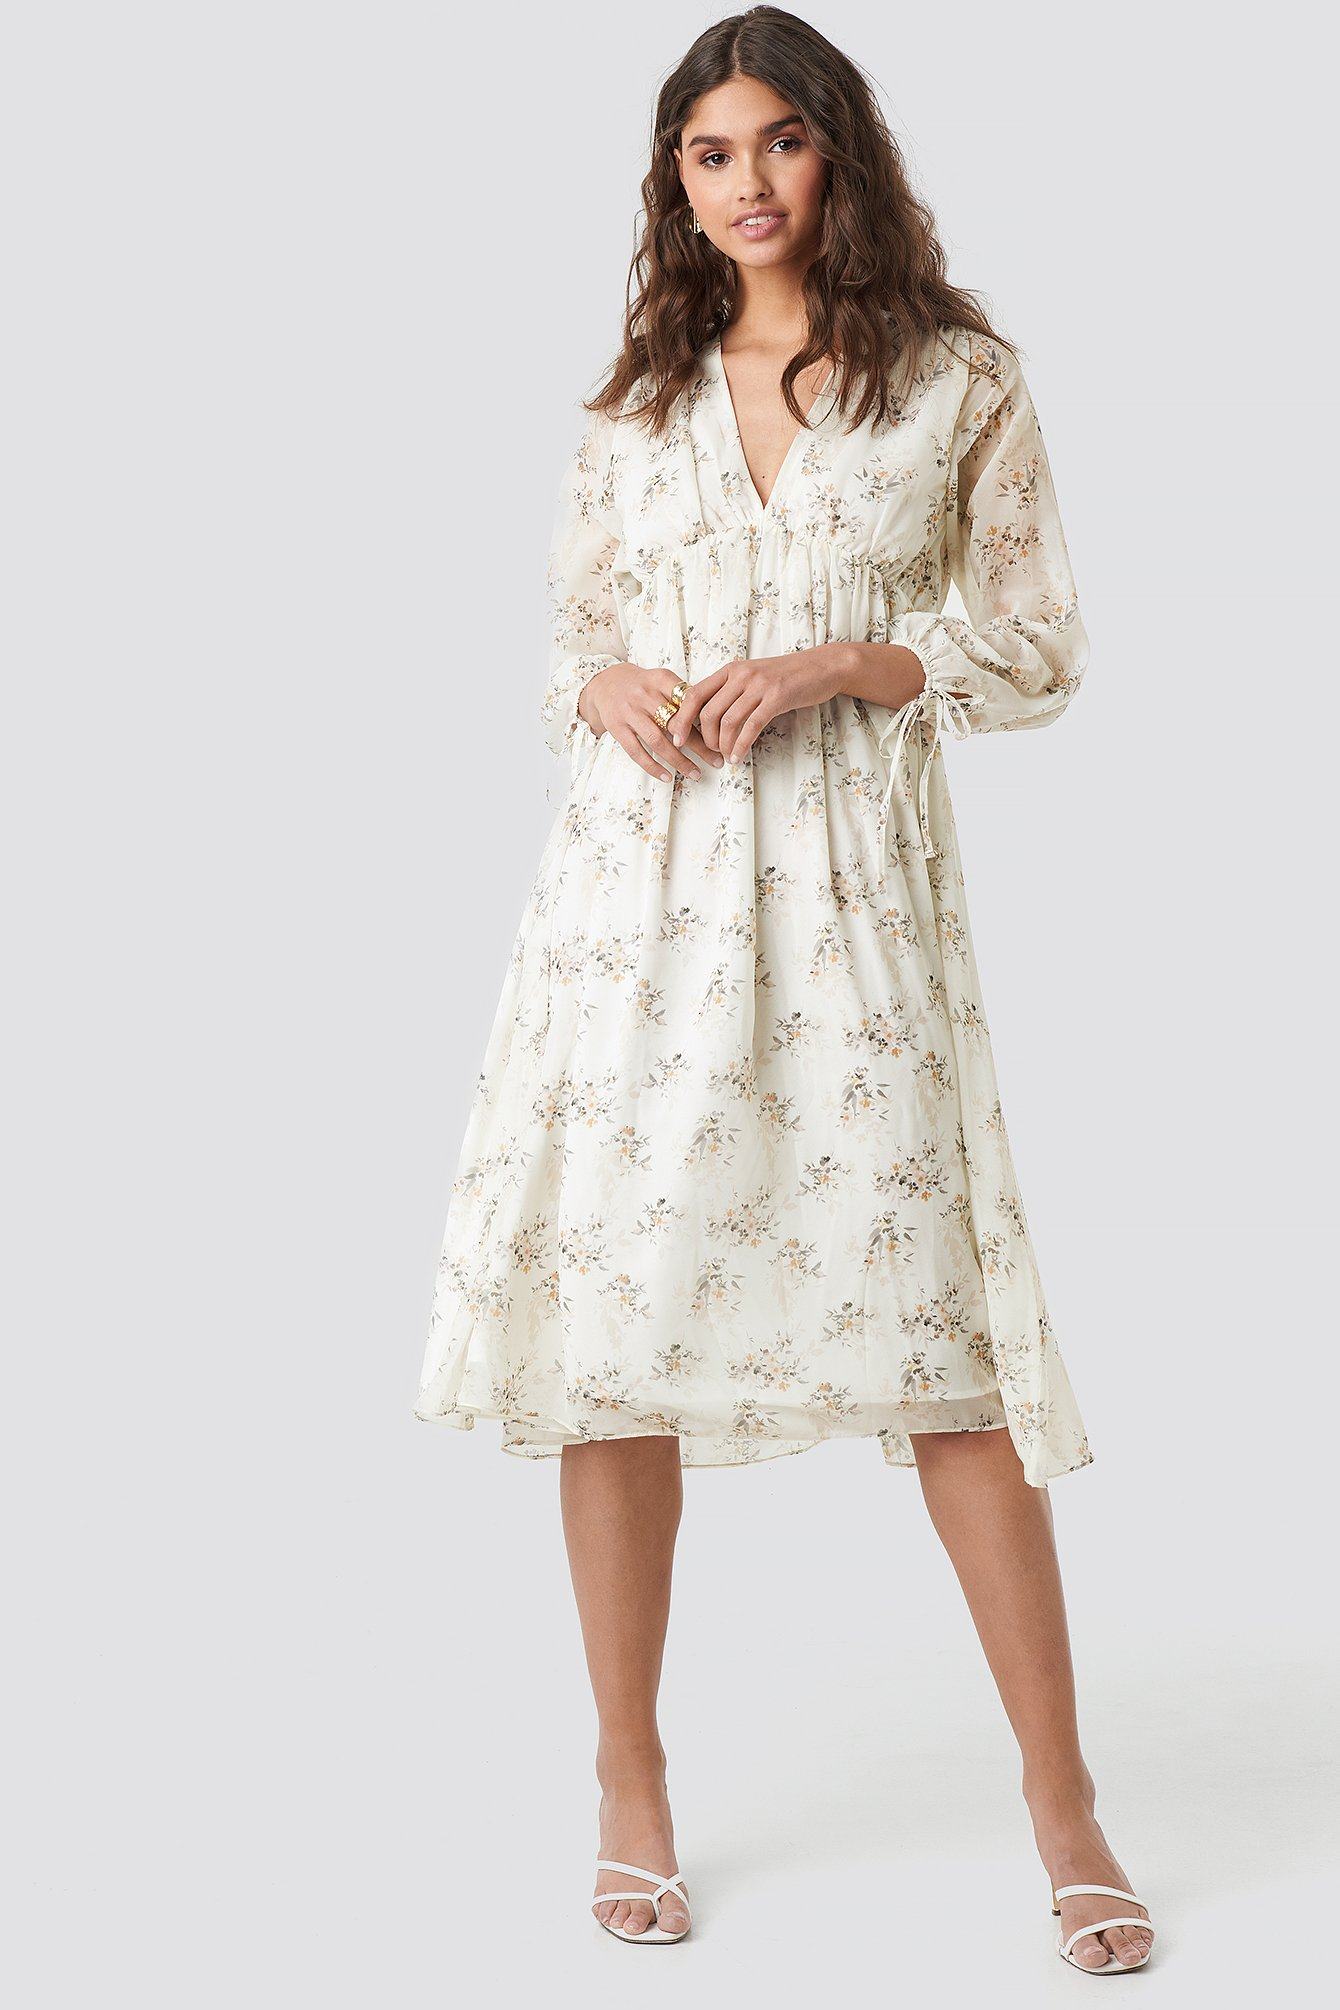 kae sutherland x na-kd -  Floral Deep V Neck Midi Dress - White